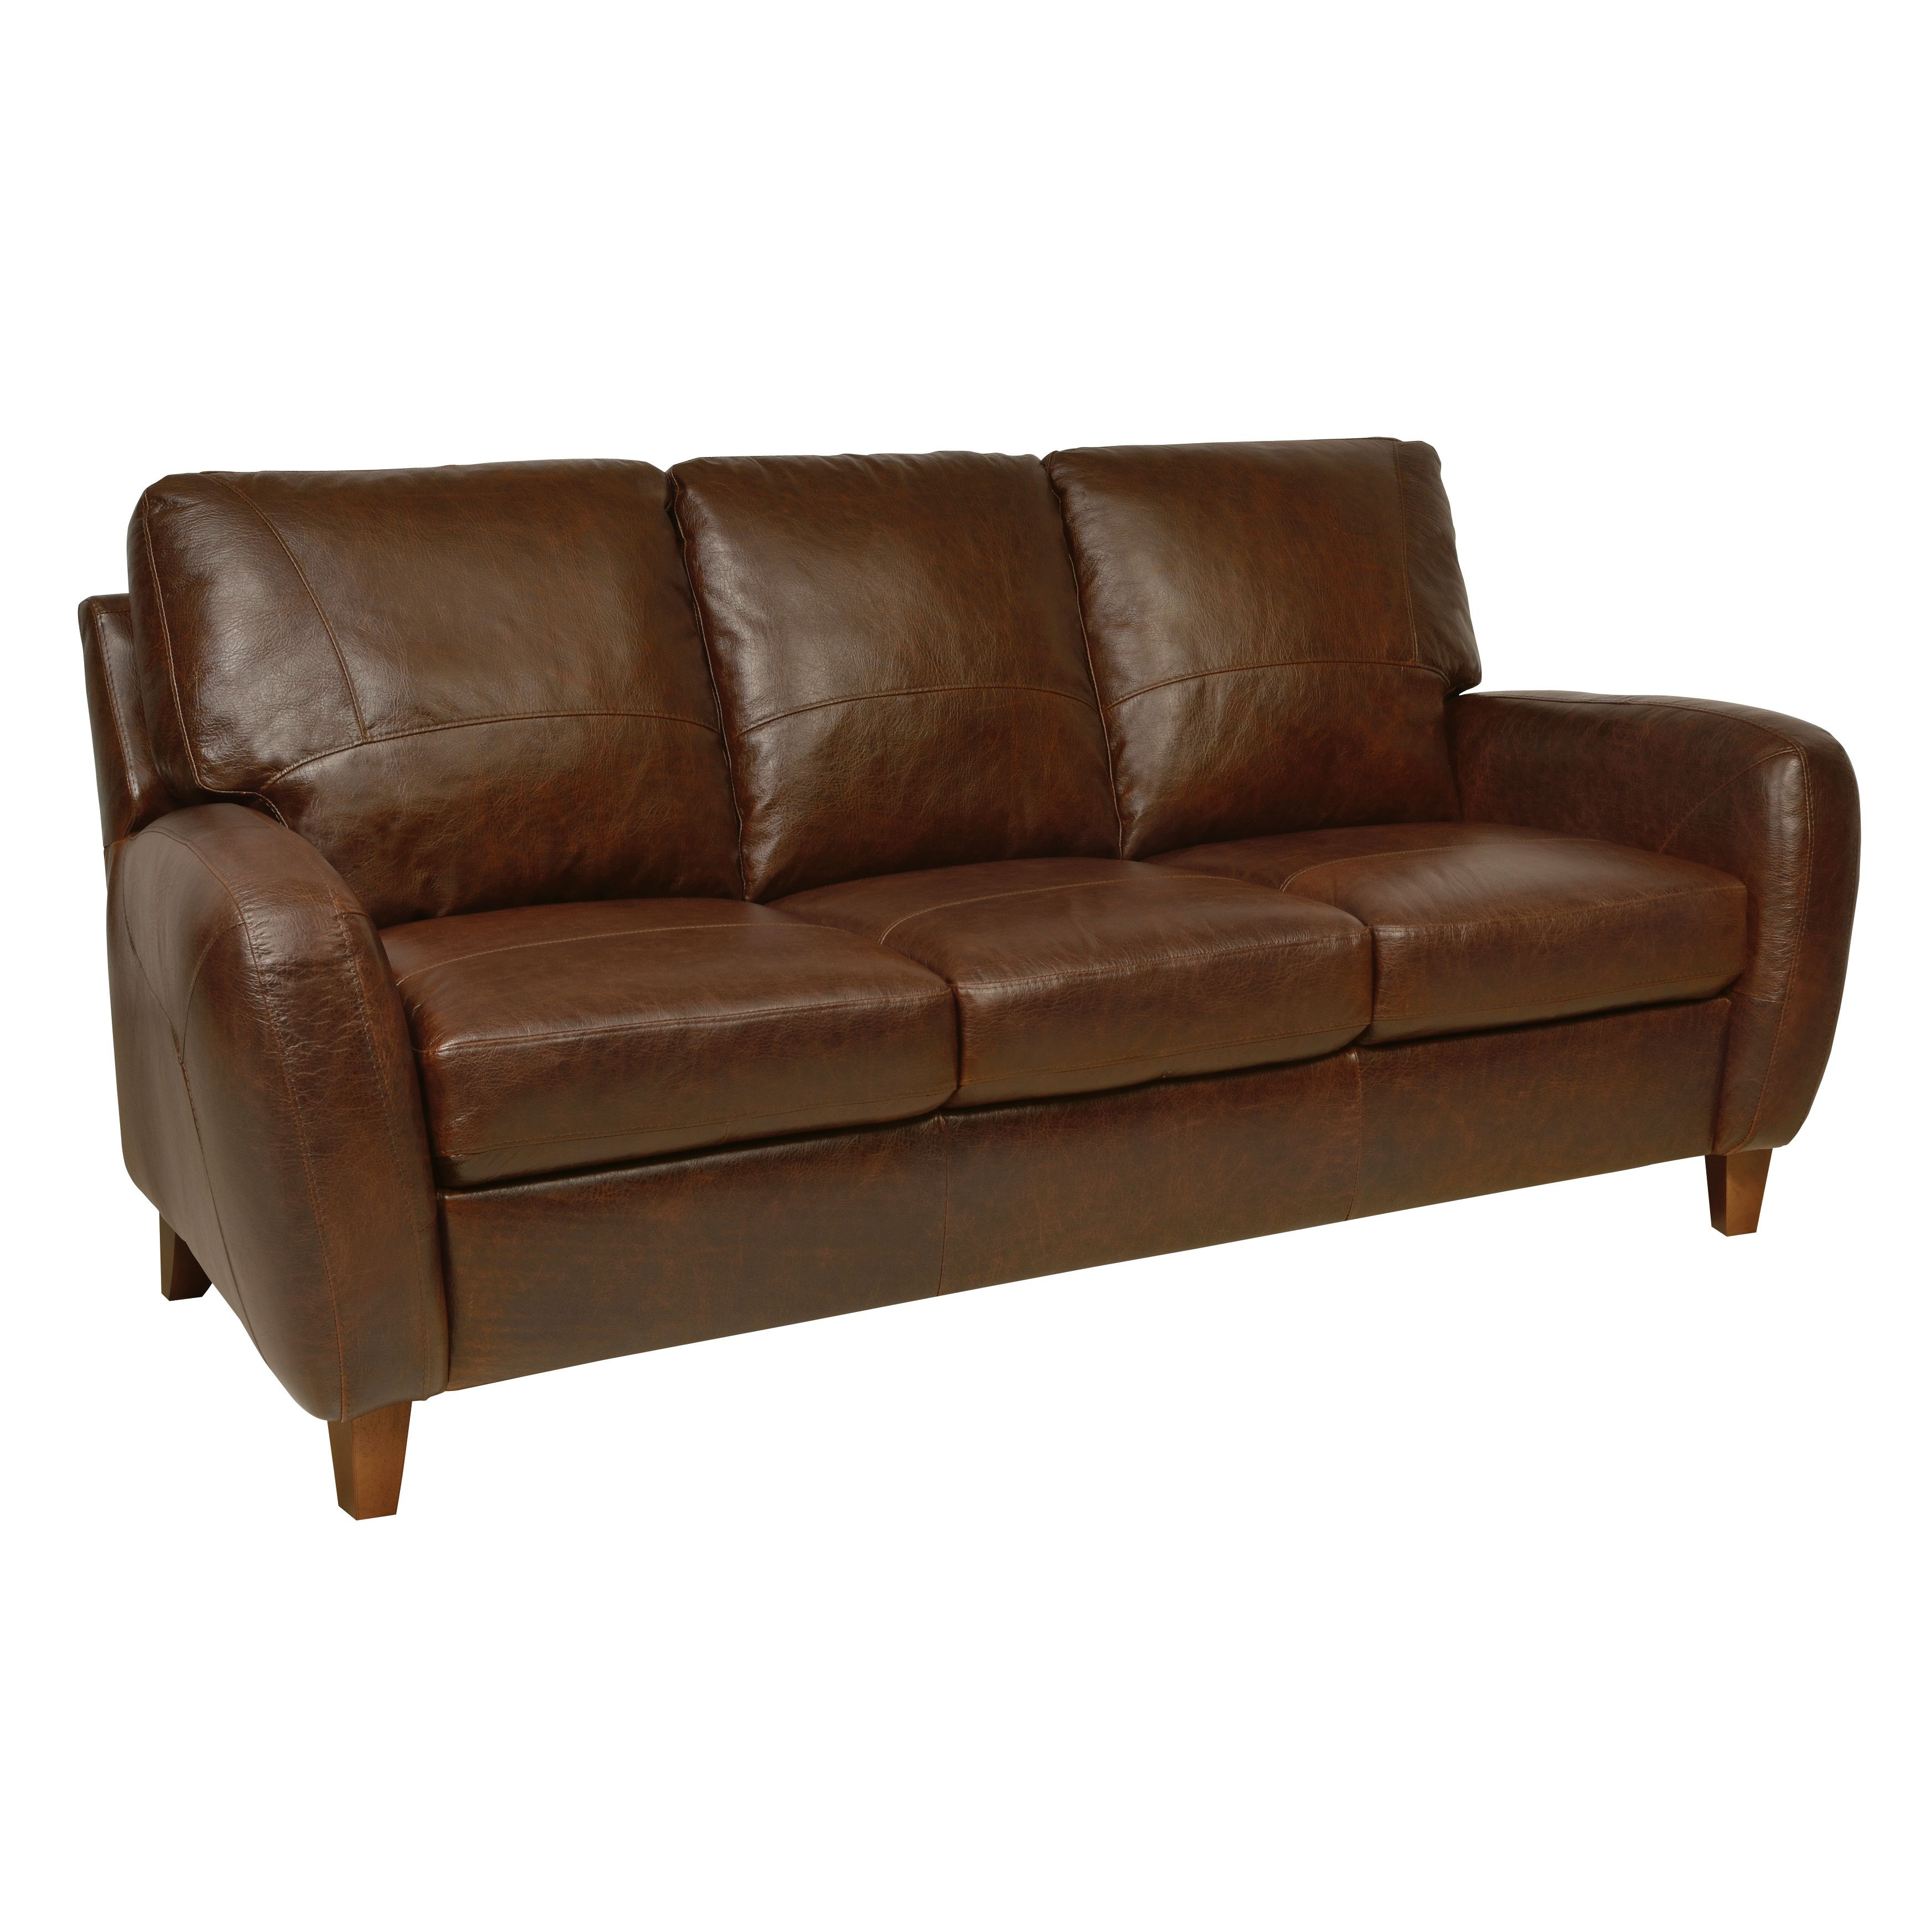 1139 Luke Leather Jennifer Leather Sofa Italian Leather Sofa Leather Sofa Reception Sofa